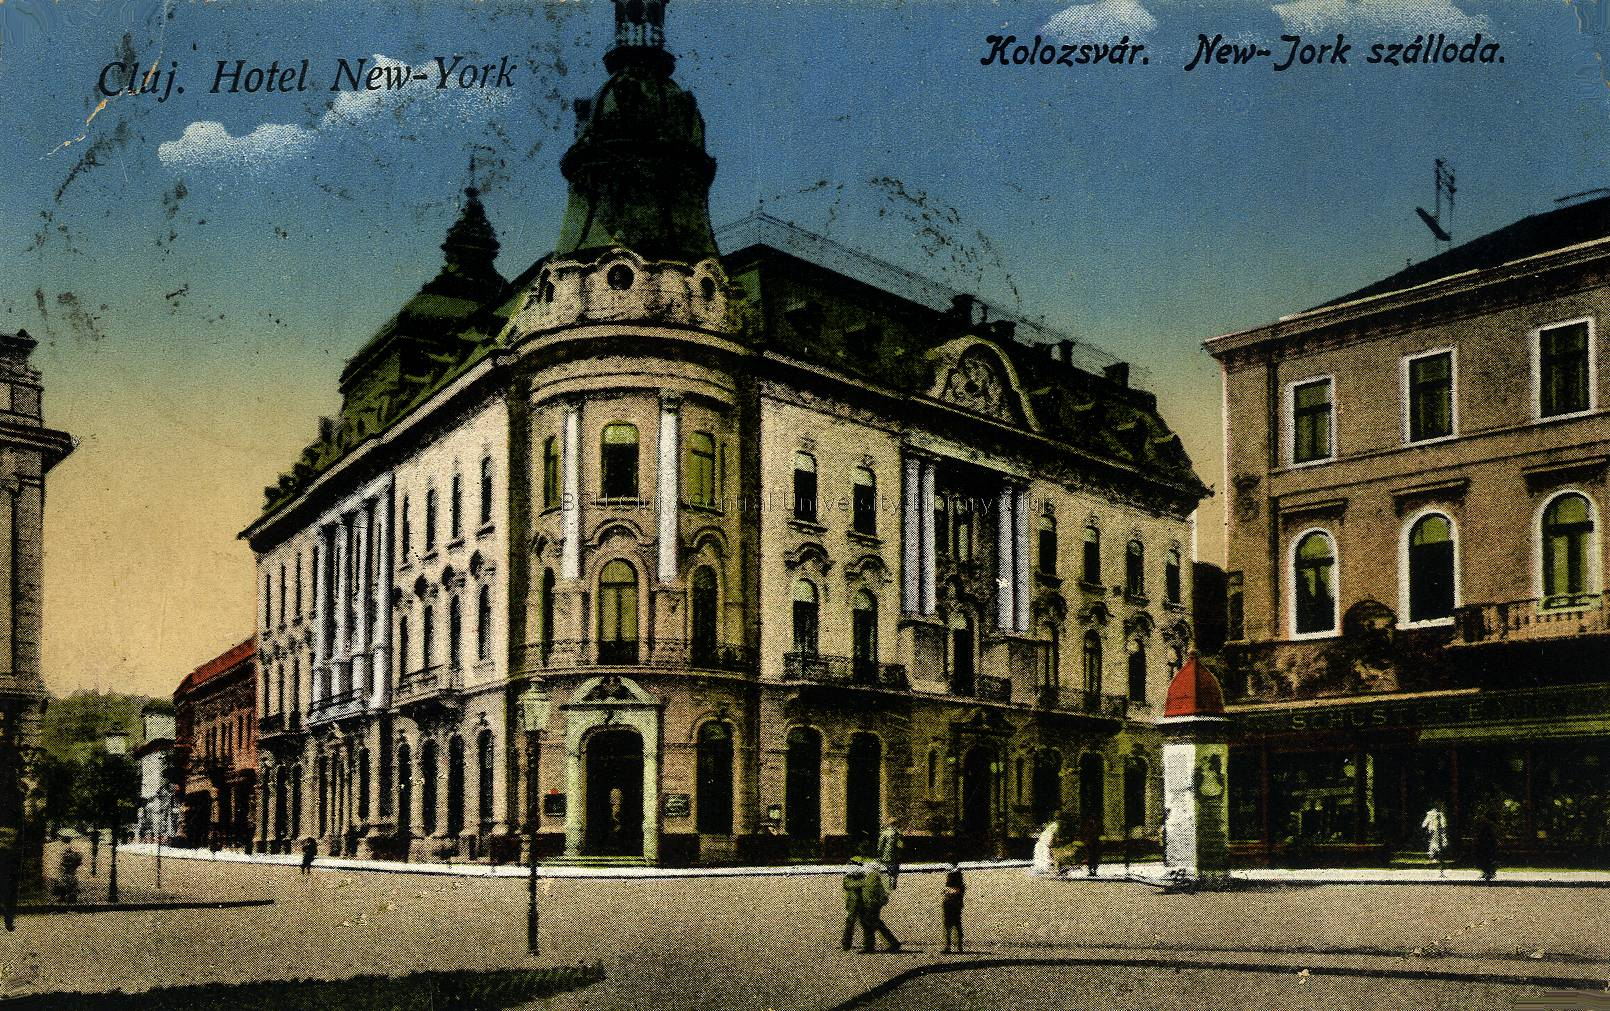 Hotel New-York, Kolozsvár (levelező-lap; Lucian Blaga Central University Library, Cluj-Napoca, Románia)